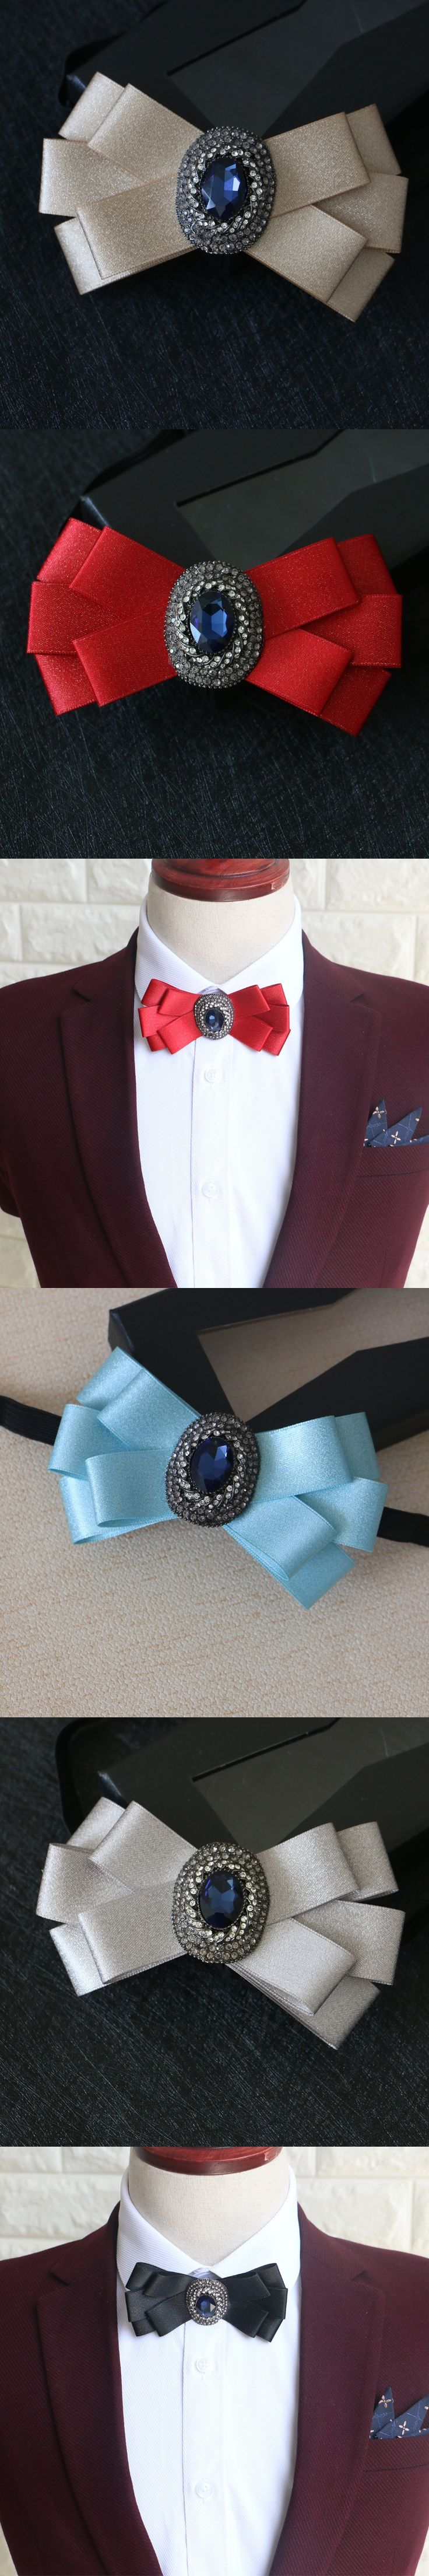 Groomsman Male Marry Diamonds Tie Groom Wedding Correct Korean. Woman Bow Black England Man Tie Neck Ties For Men Necktie